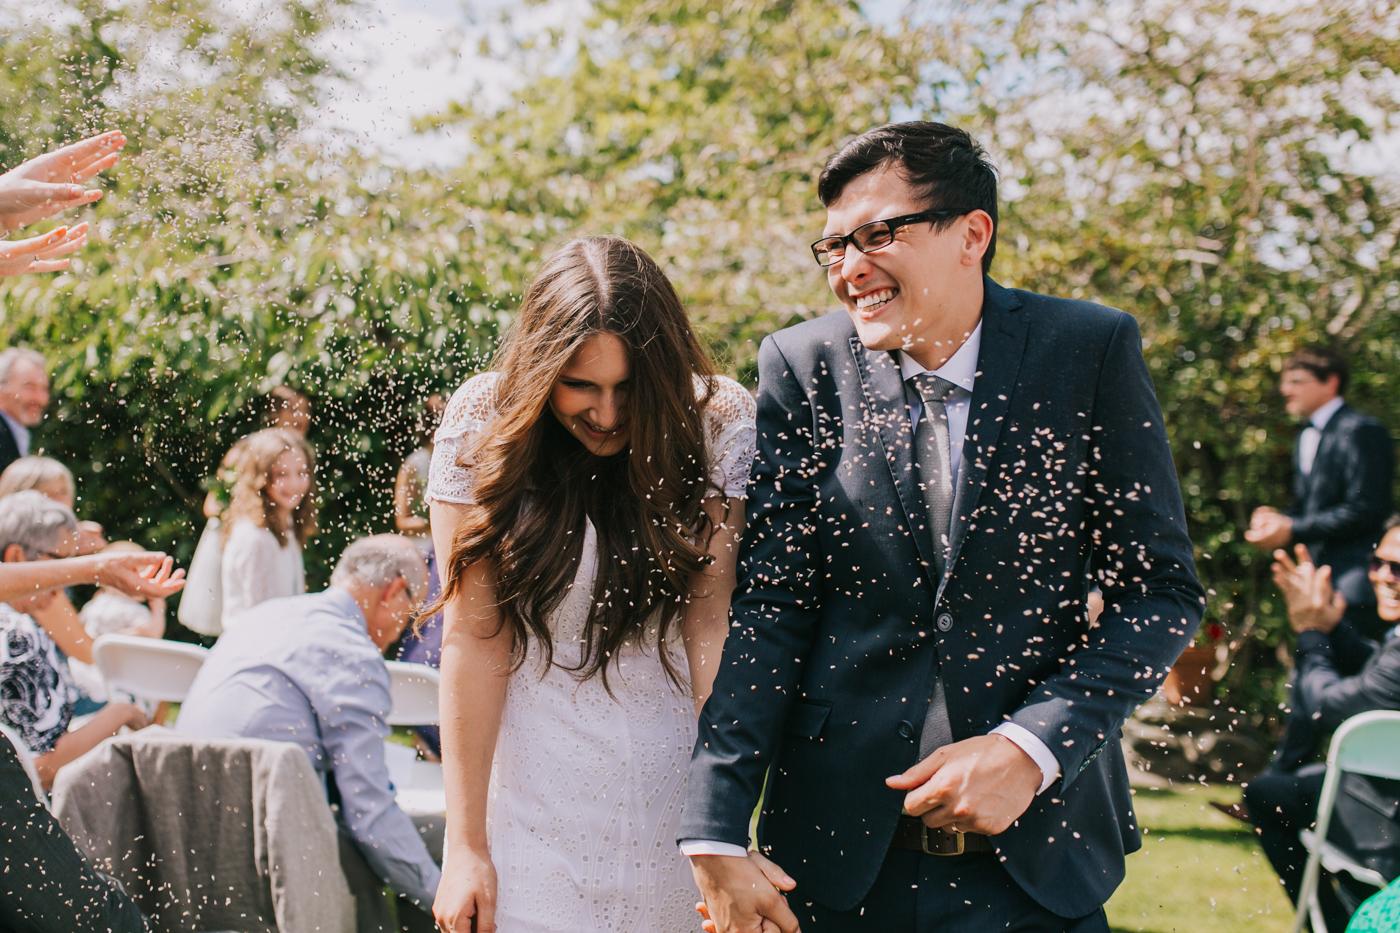 Ariana & Tim - Dunedin, New Zealand Wedding - Destination Wedding - Samantha Heather Photography-108.jpg